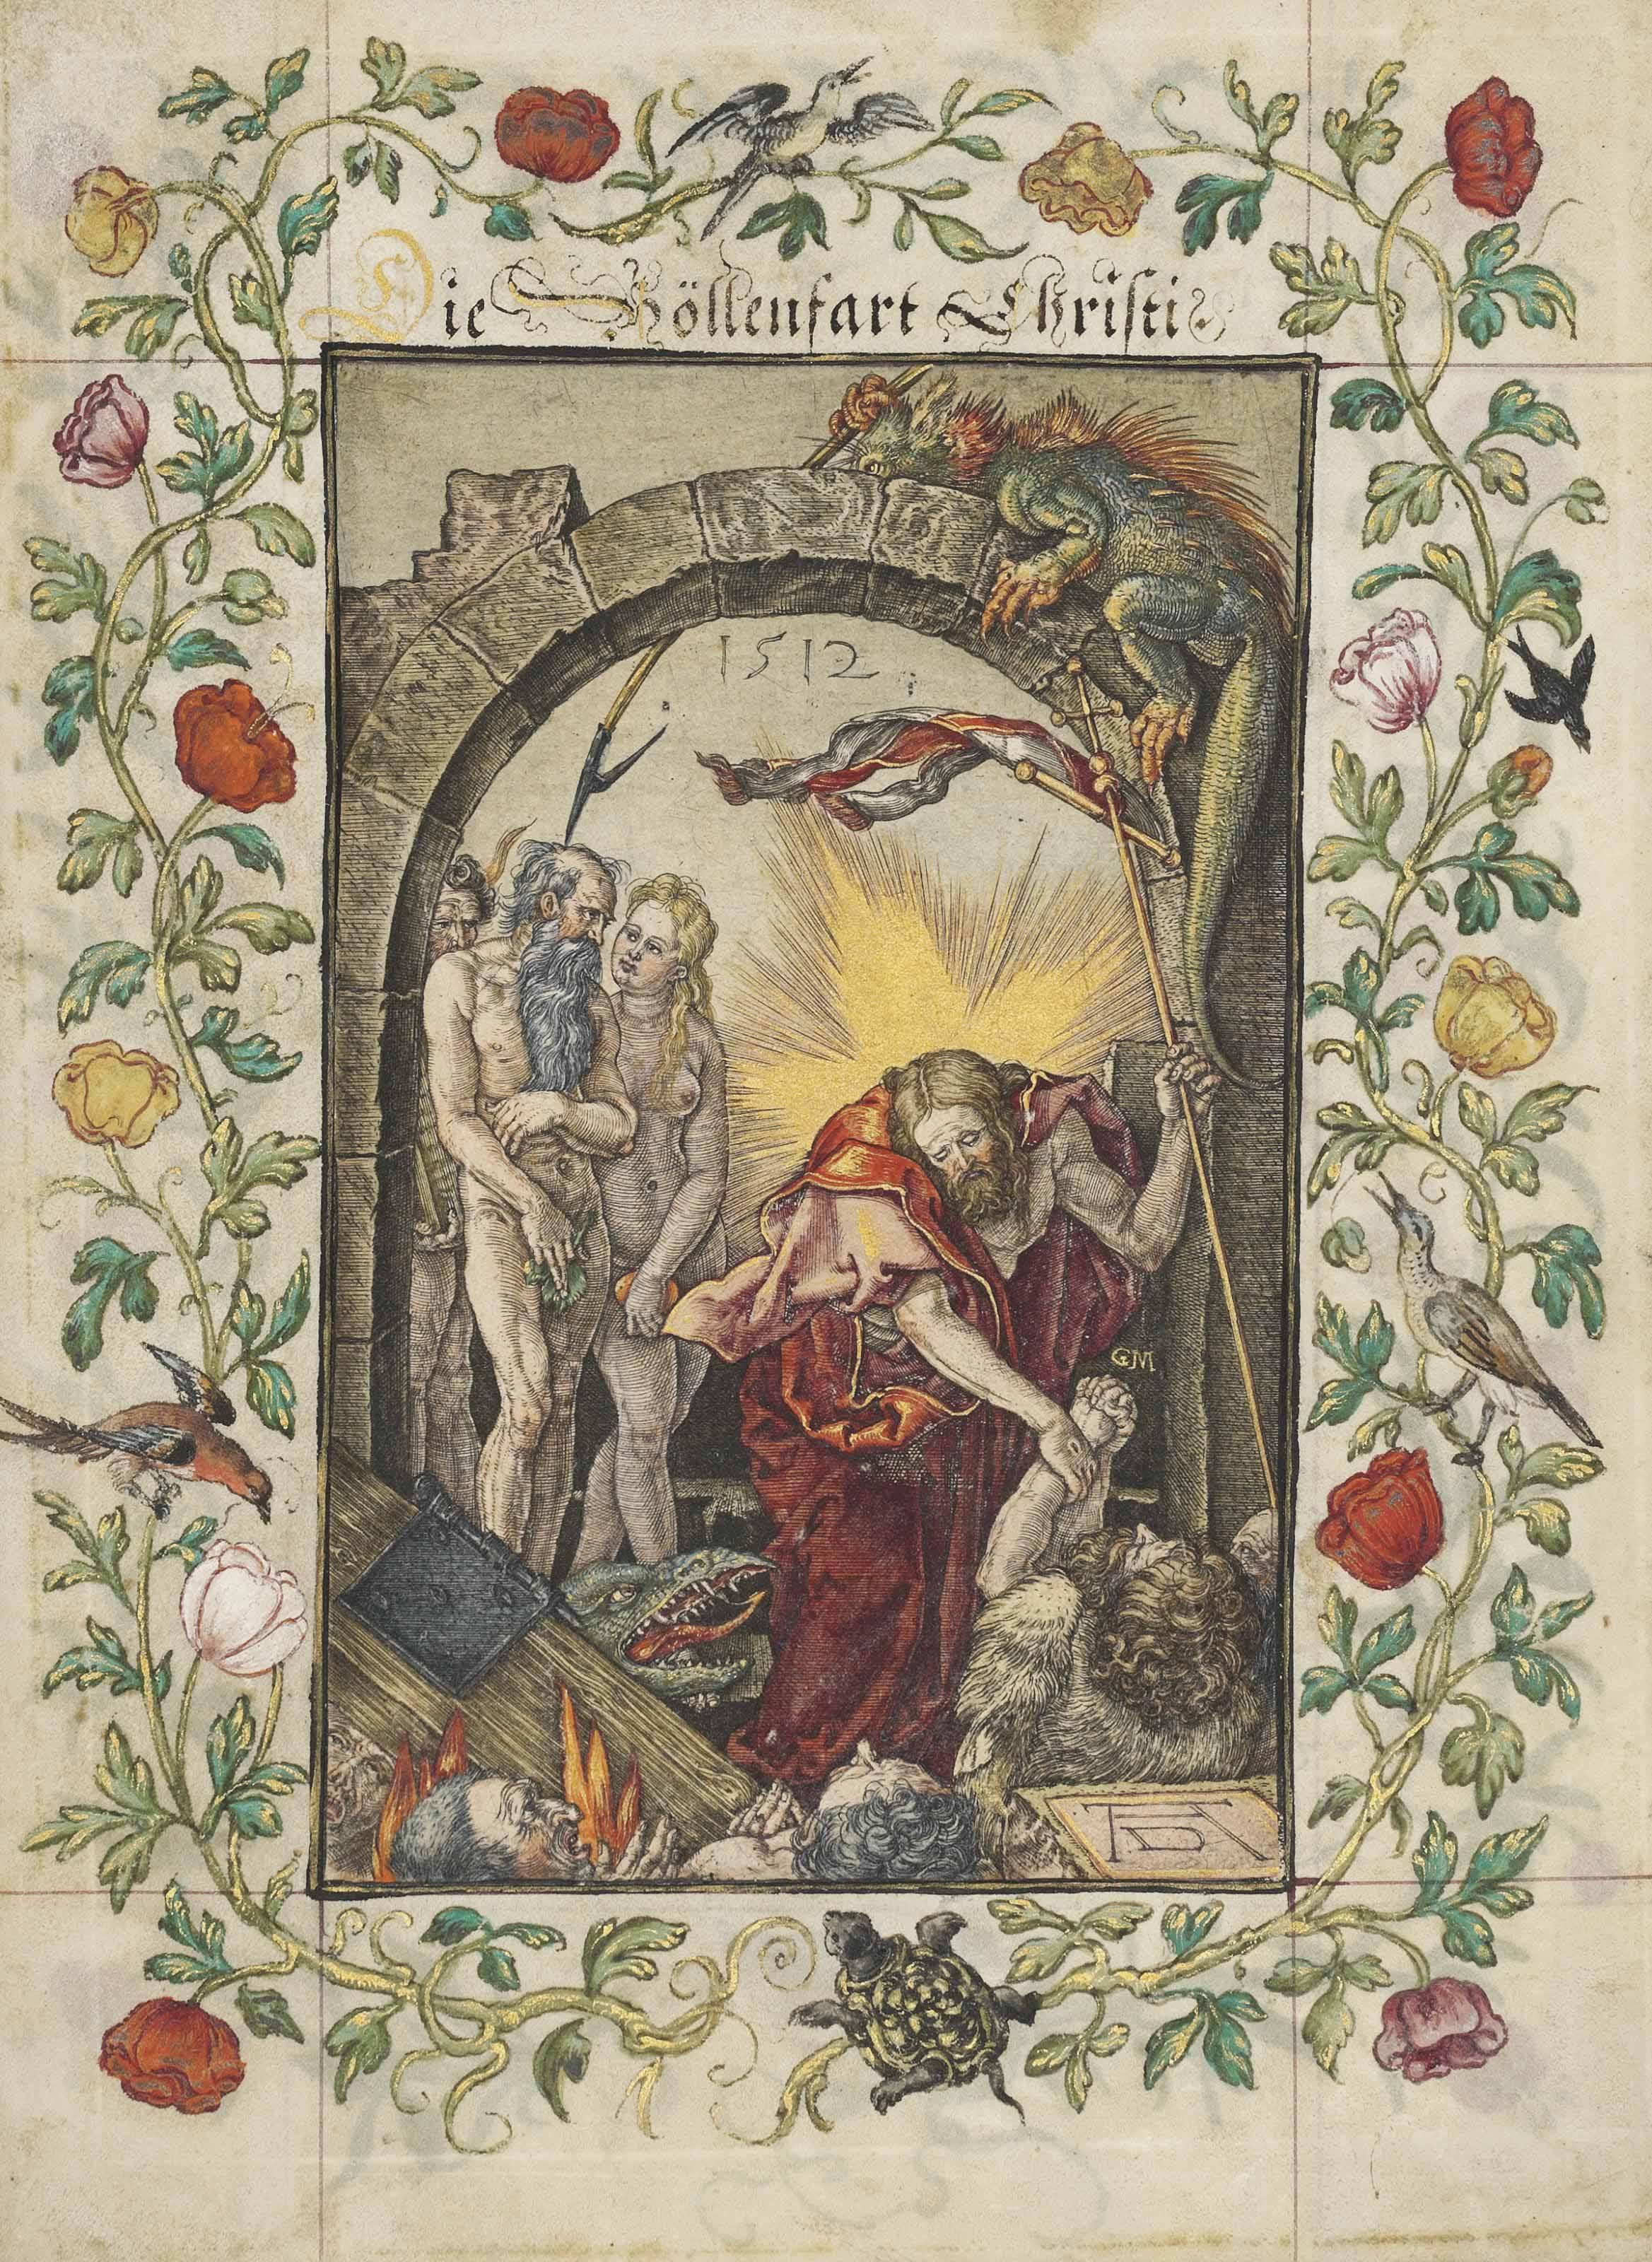 Albrecht Dürer and Georg Mack the Elder